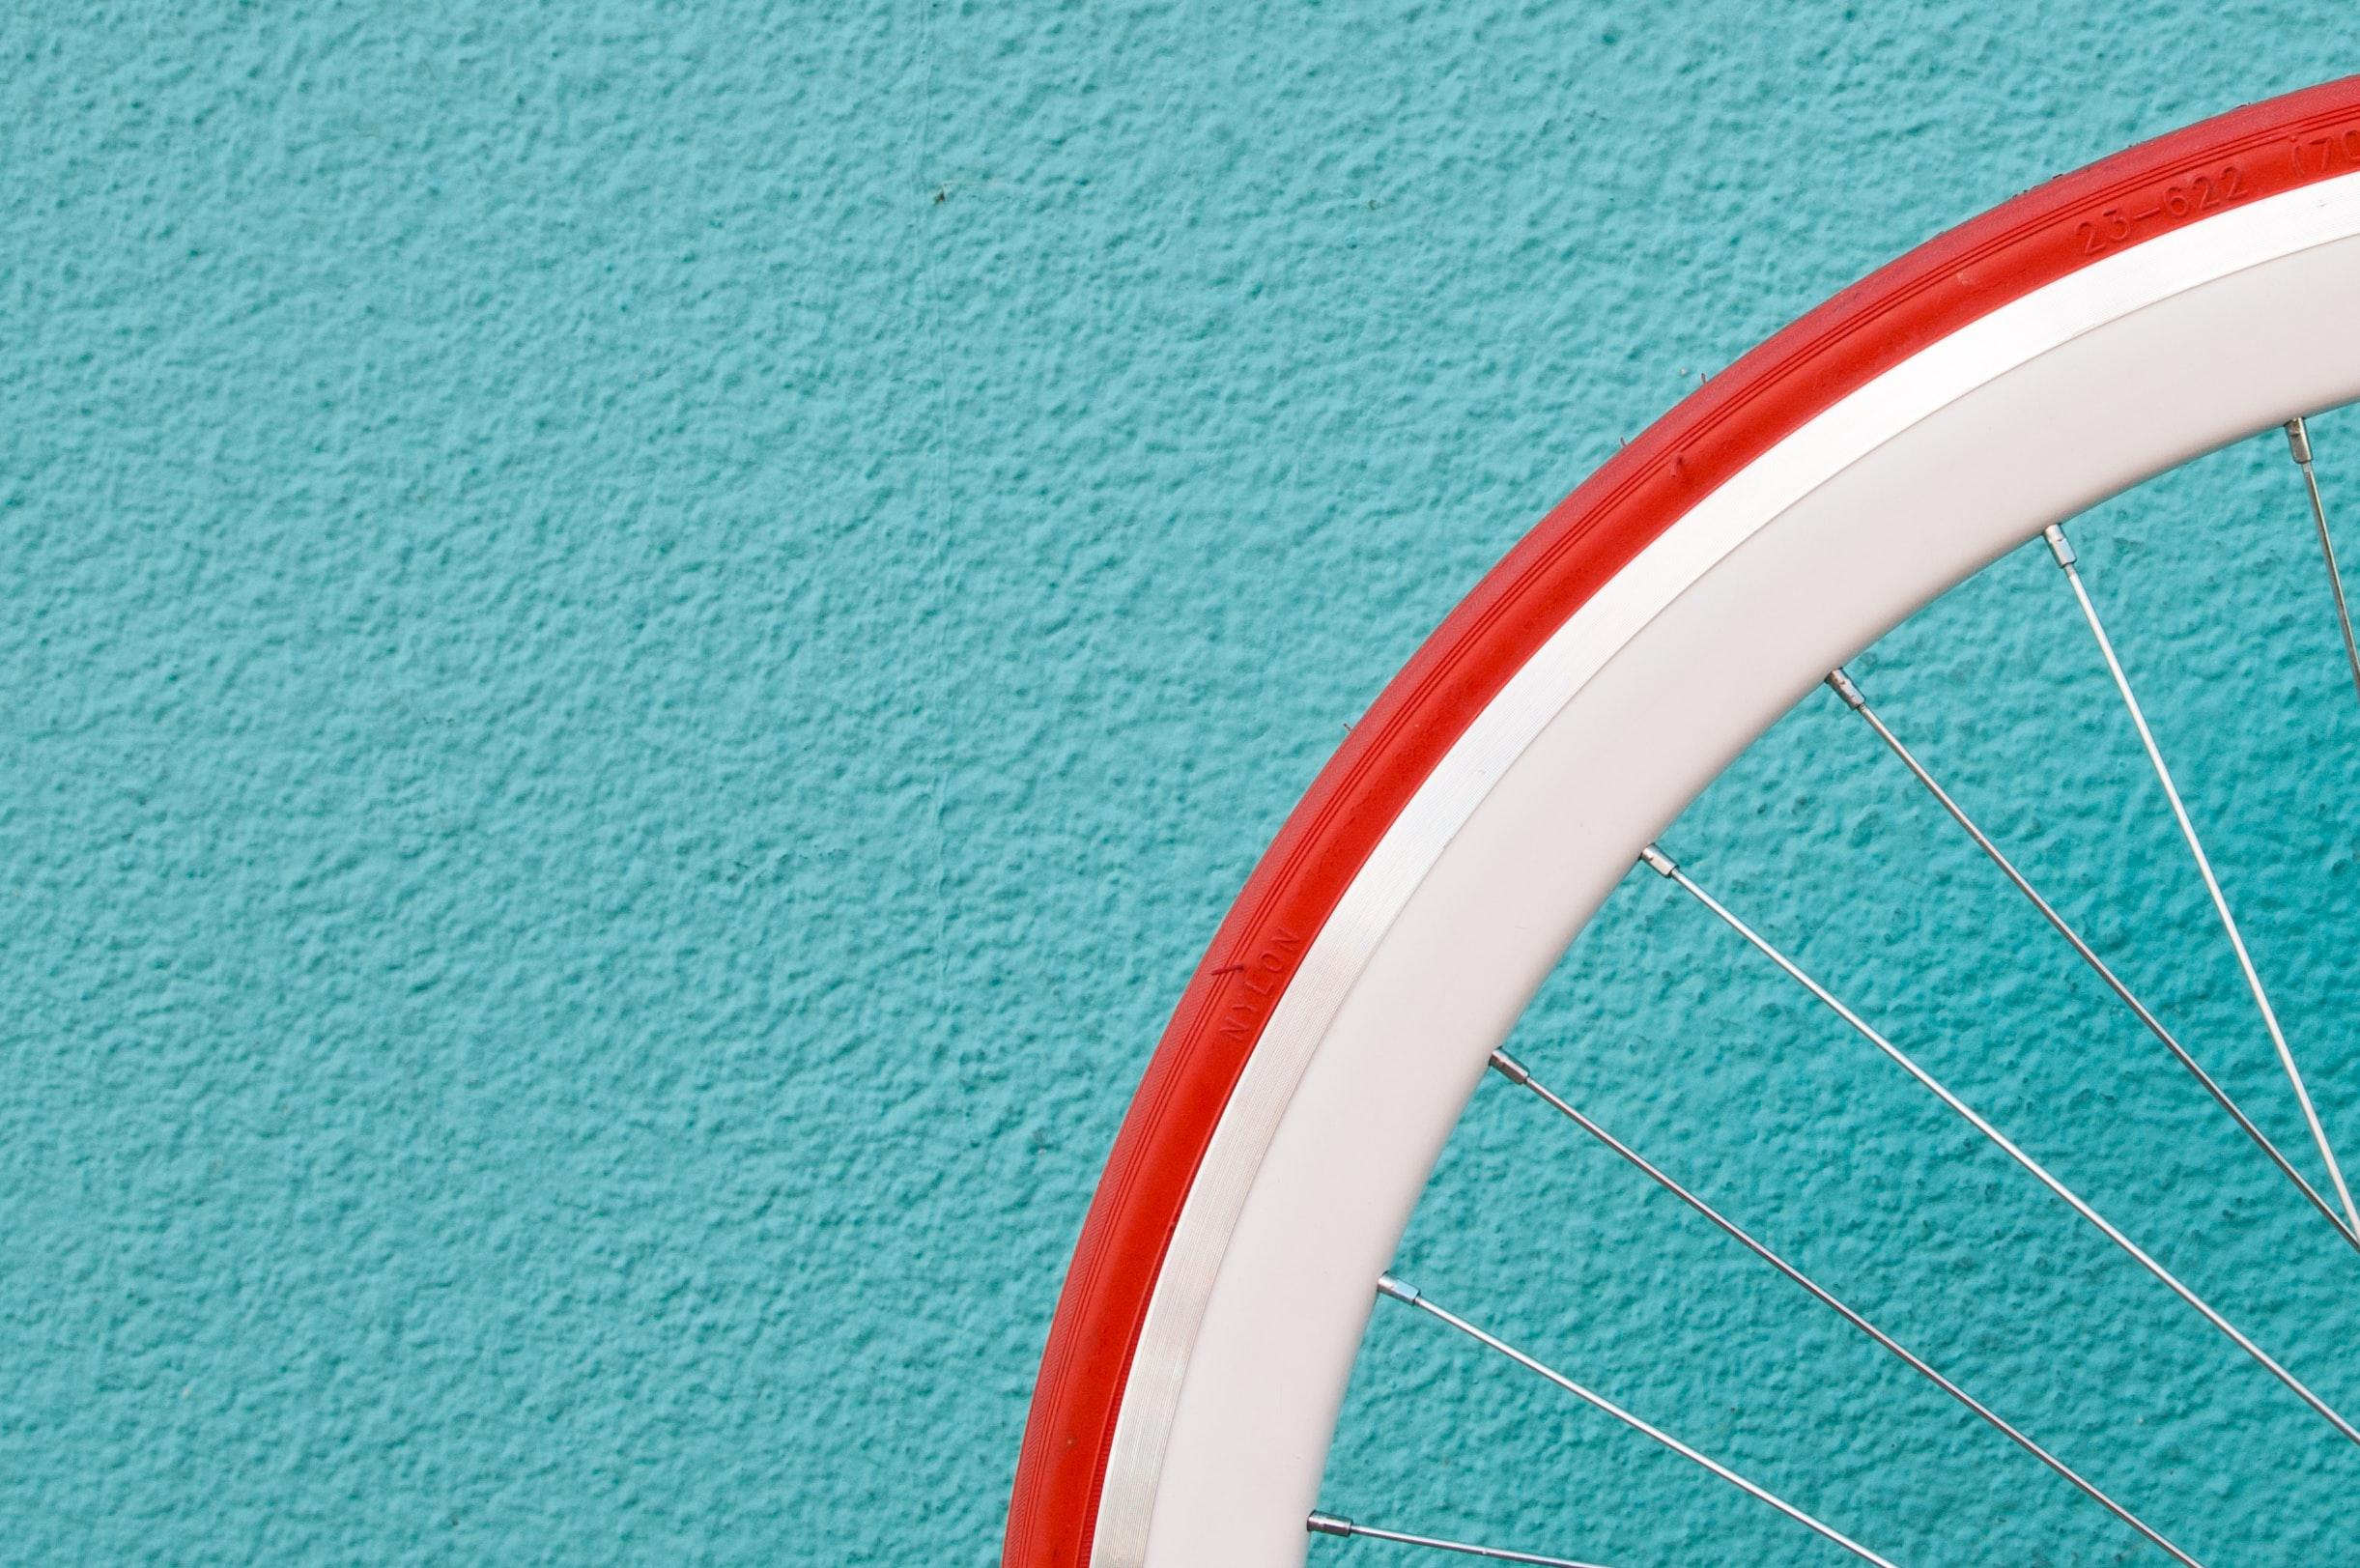 baromètre cycliste - unsplash - alessandra caretto